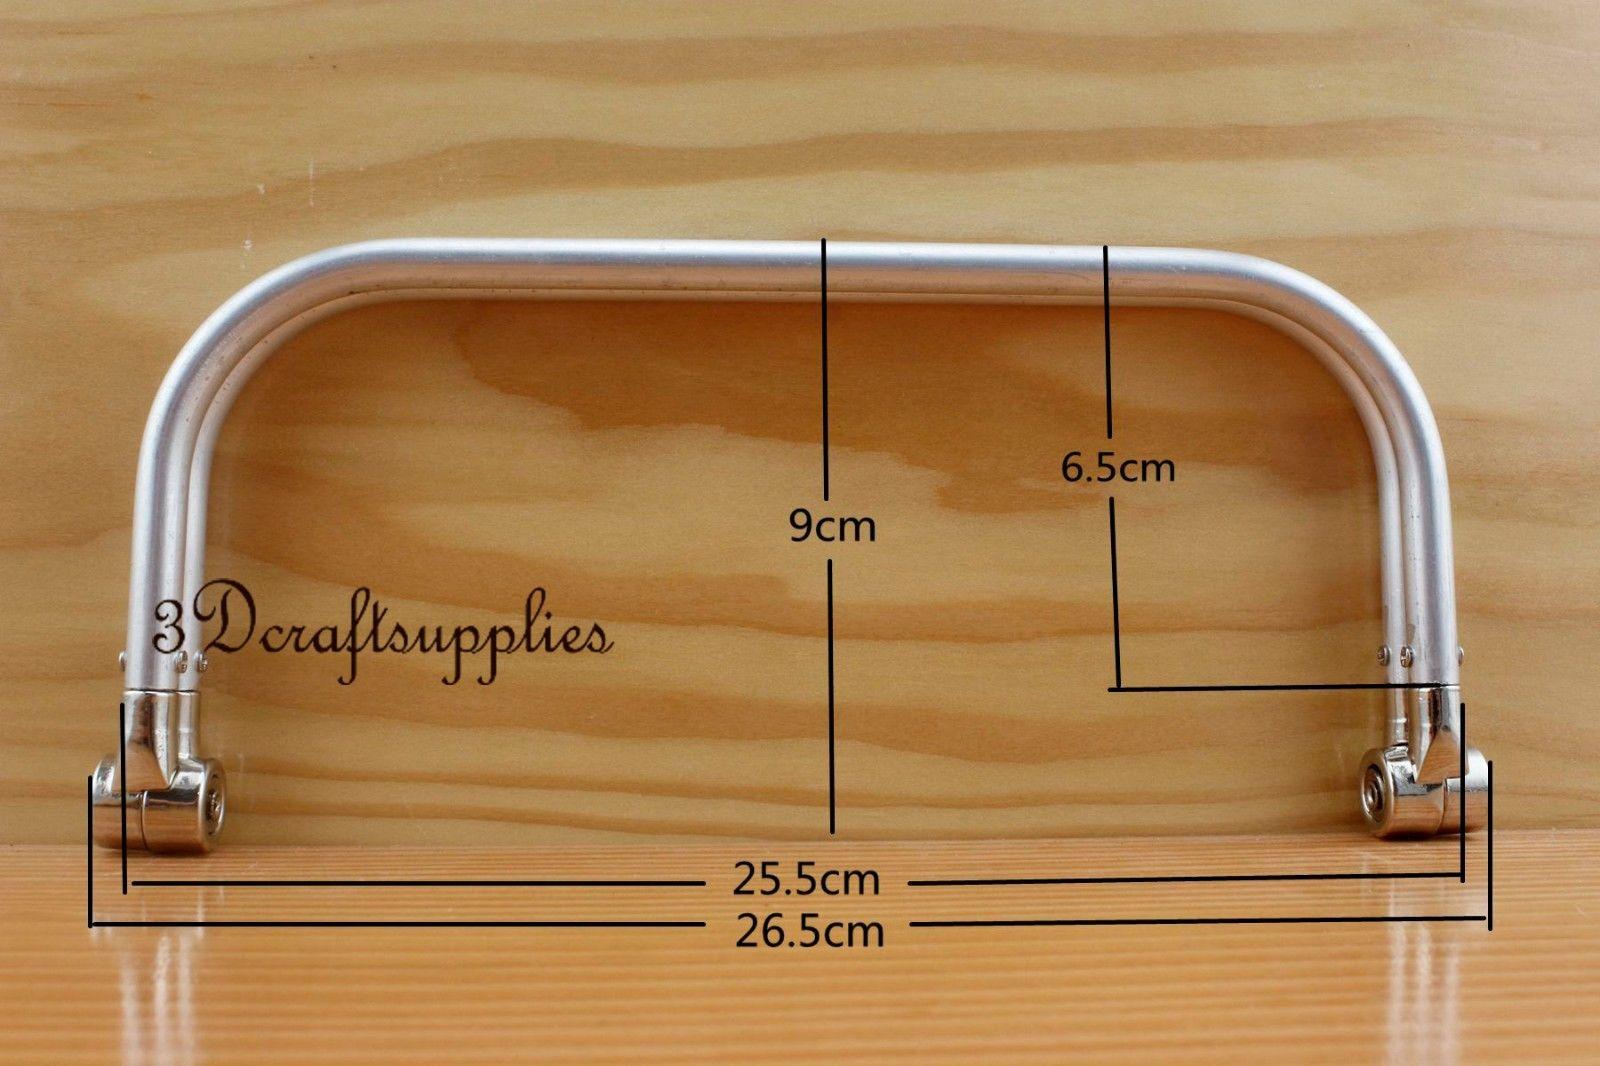 10 Inch Metal Frame Aluminous Tubular Internal Hinge Bag Frame Bag Handle Z25